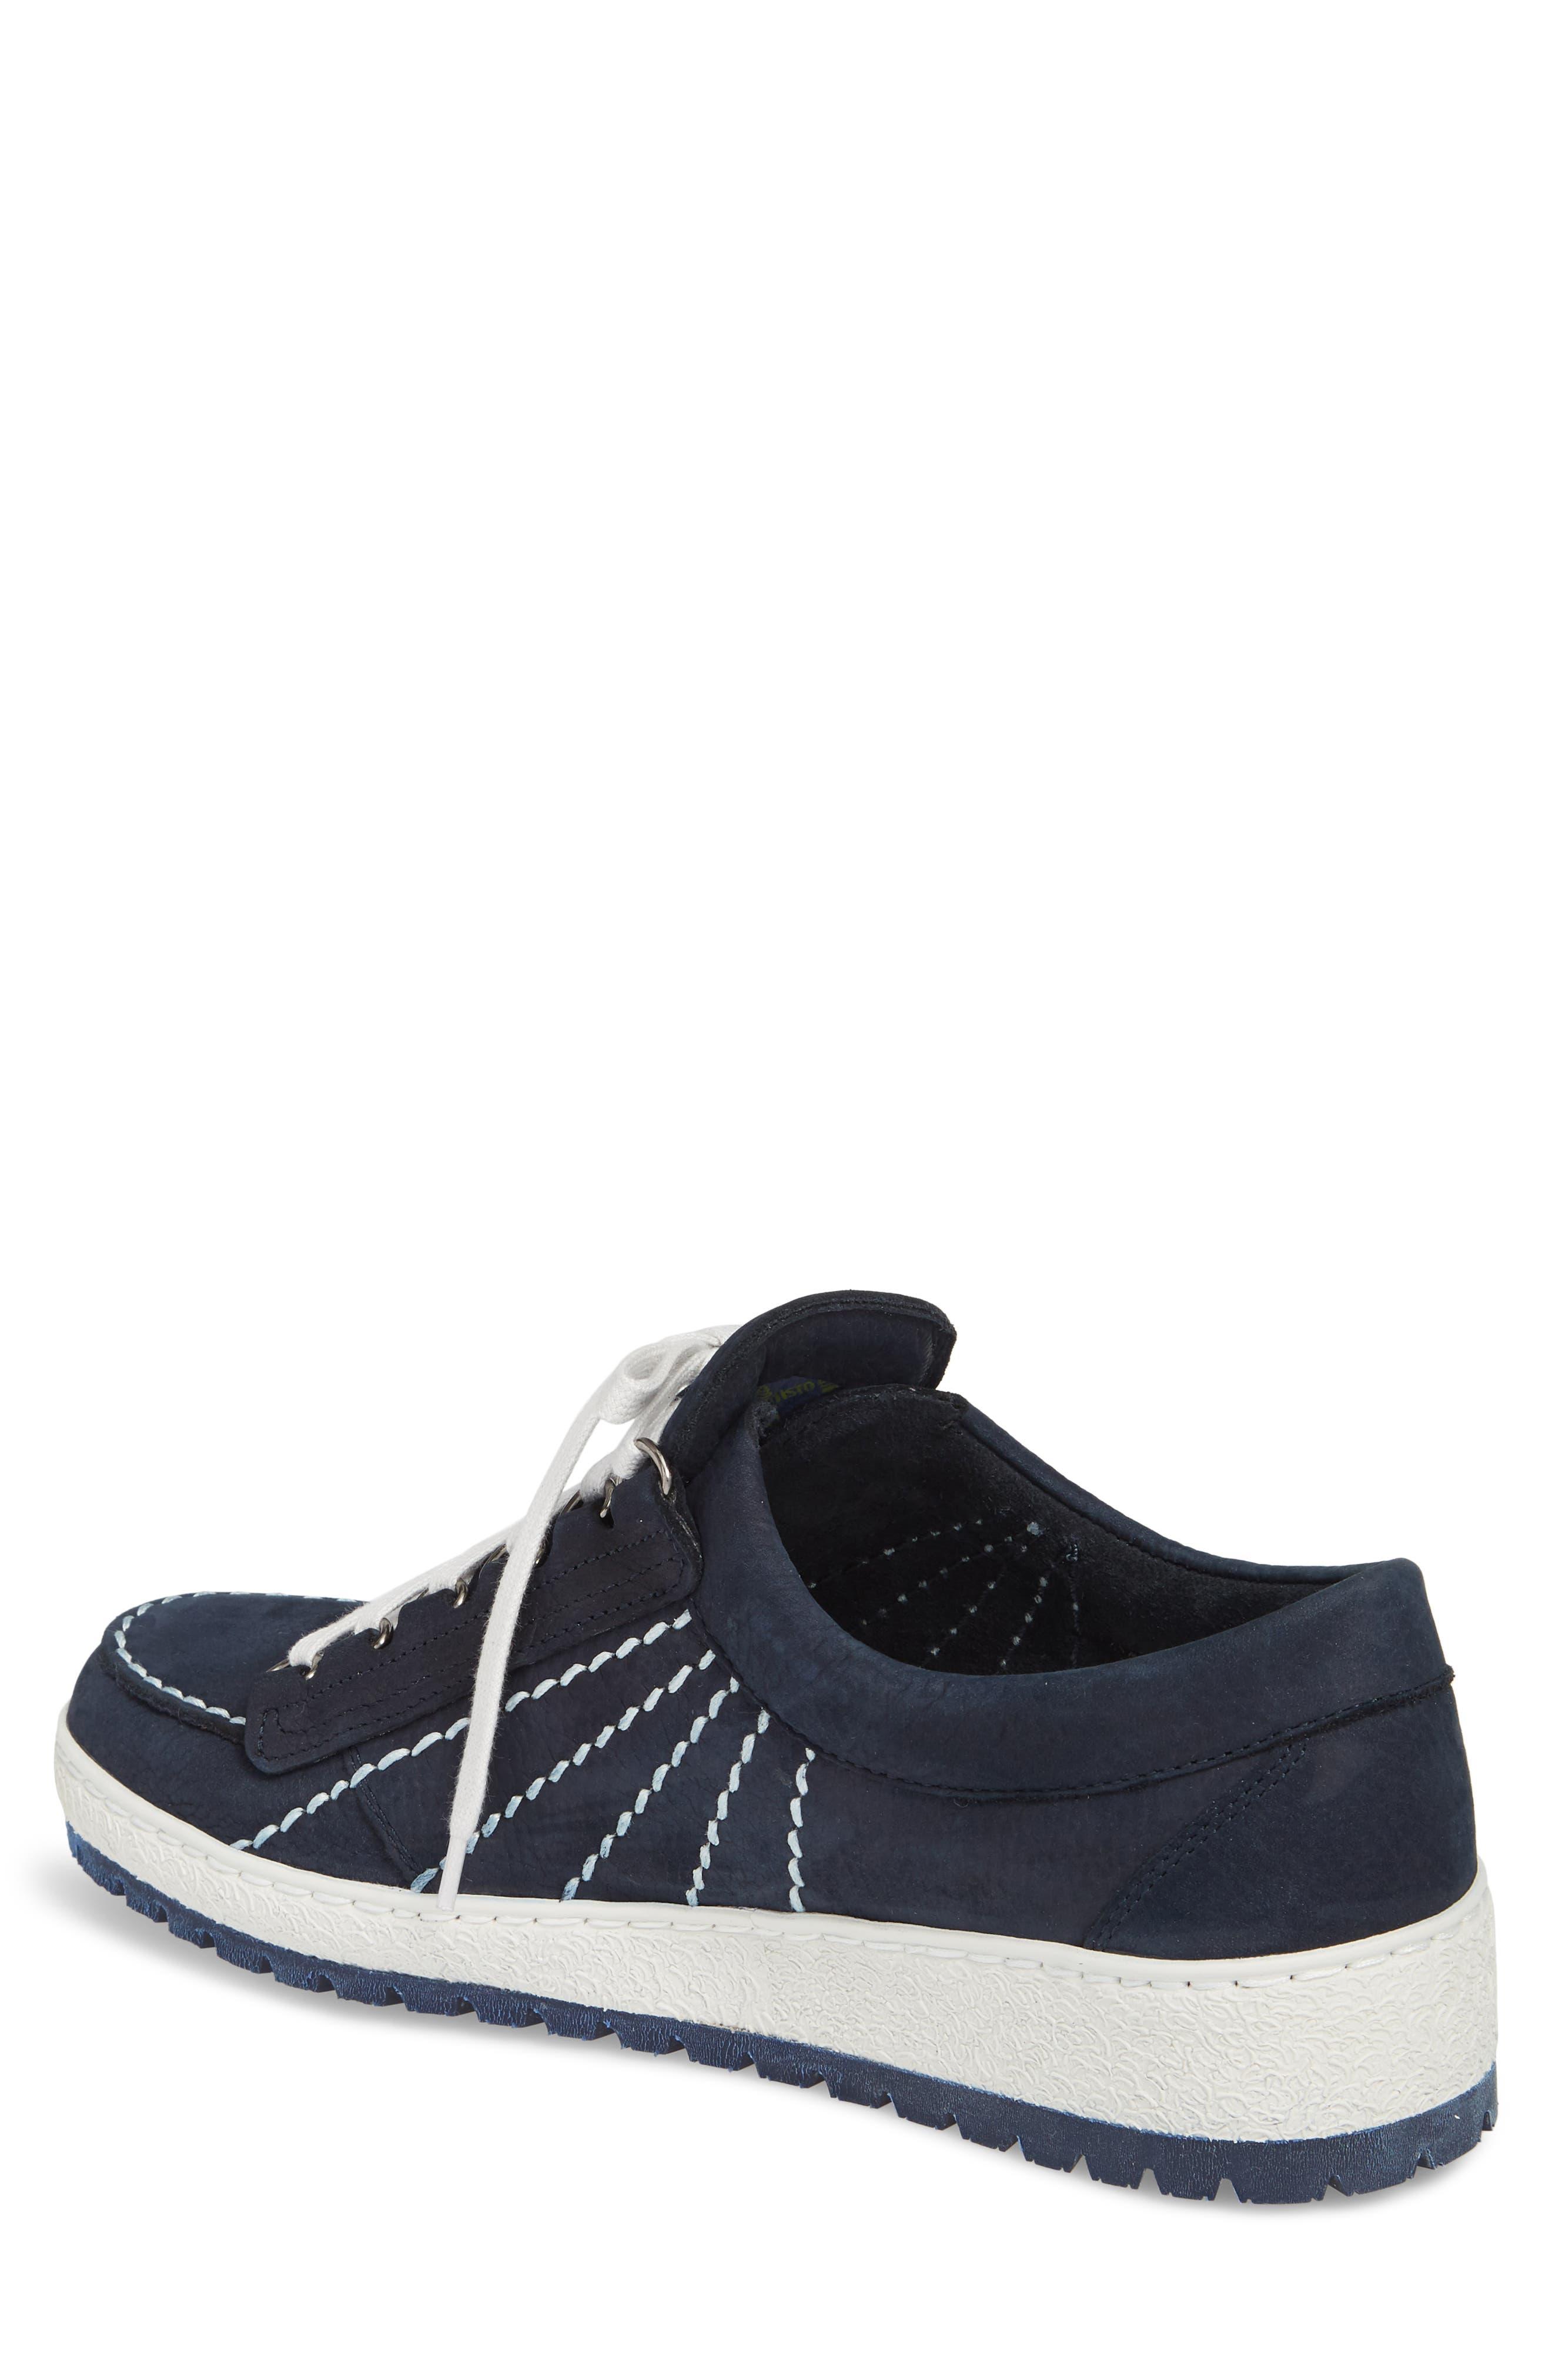 Rainbow Sneaker,                             Alternate thumbnail 2, color,                             Navy